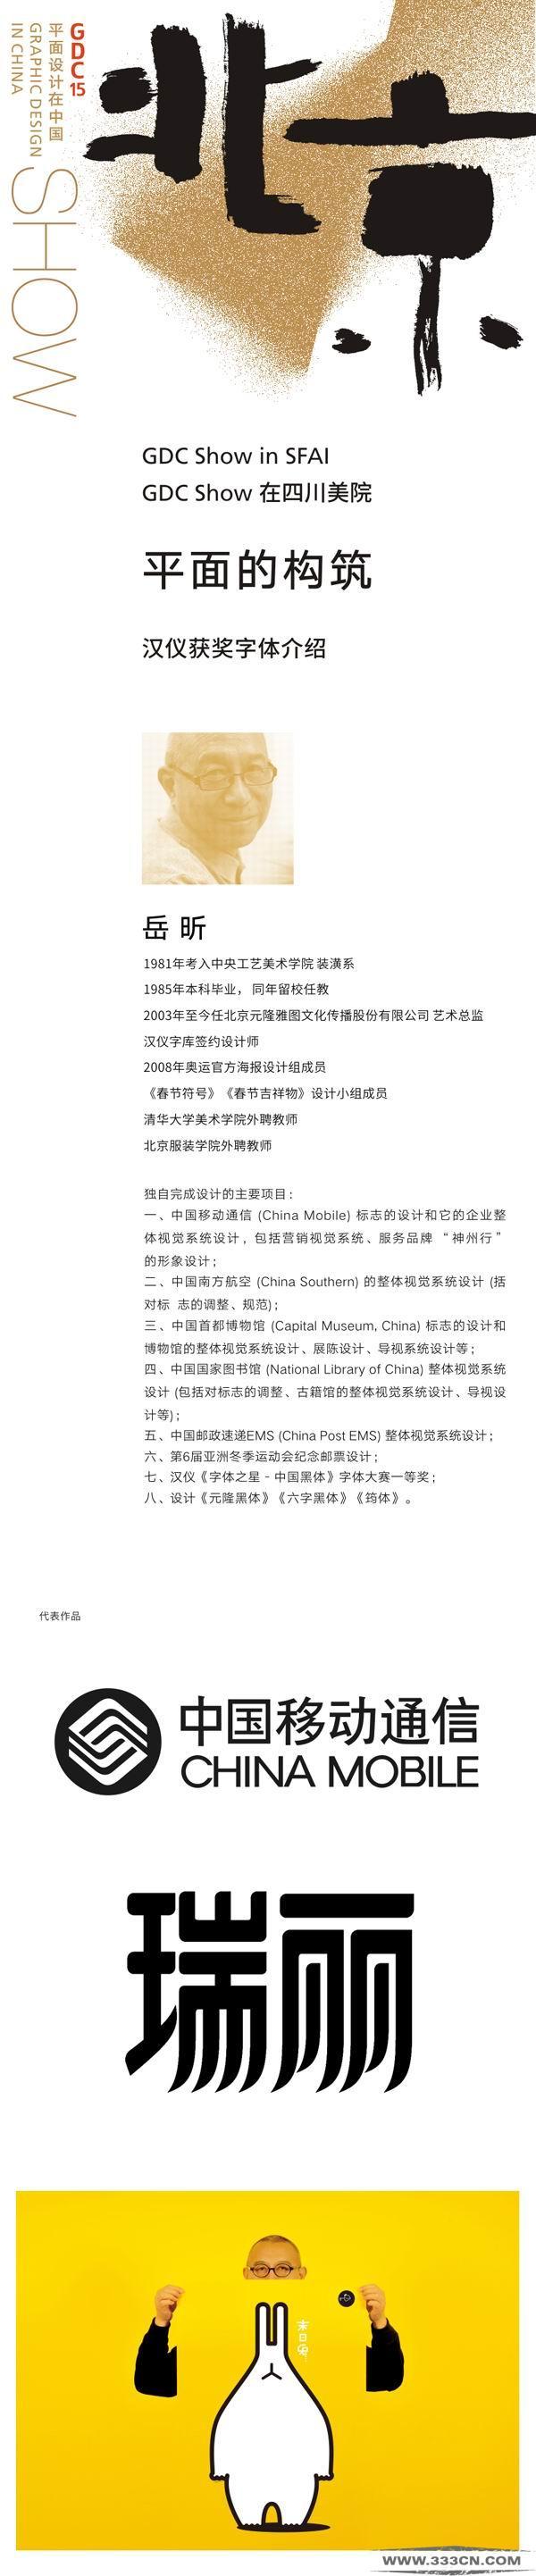 GDC Show 在清华 平面的构筑 平面设计在中国